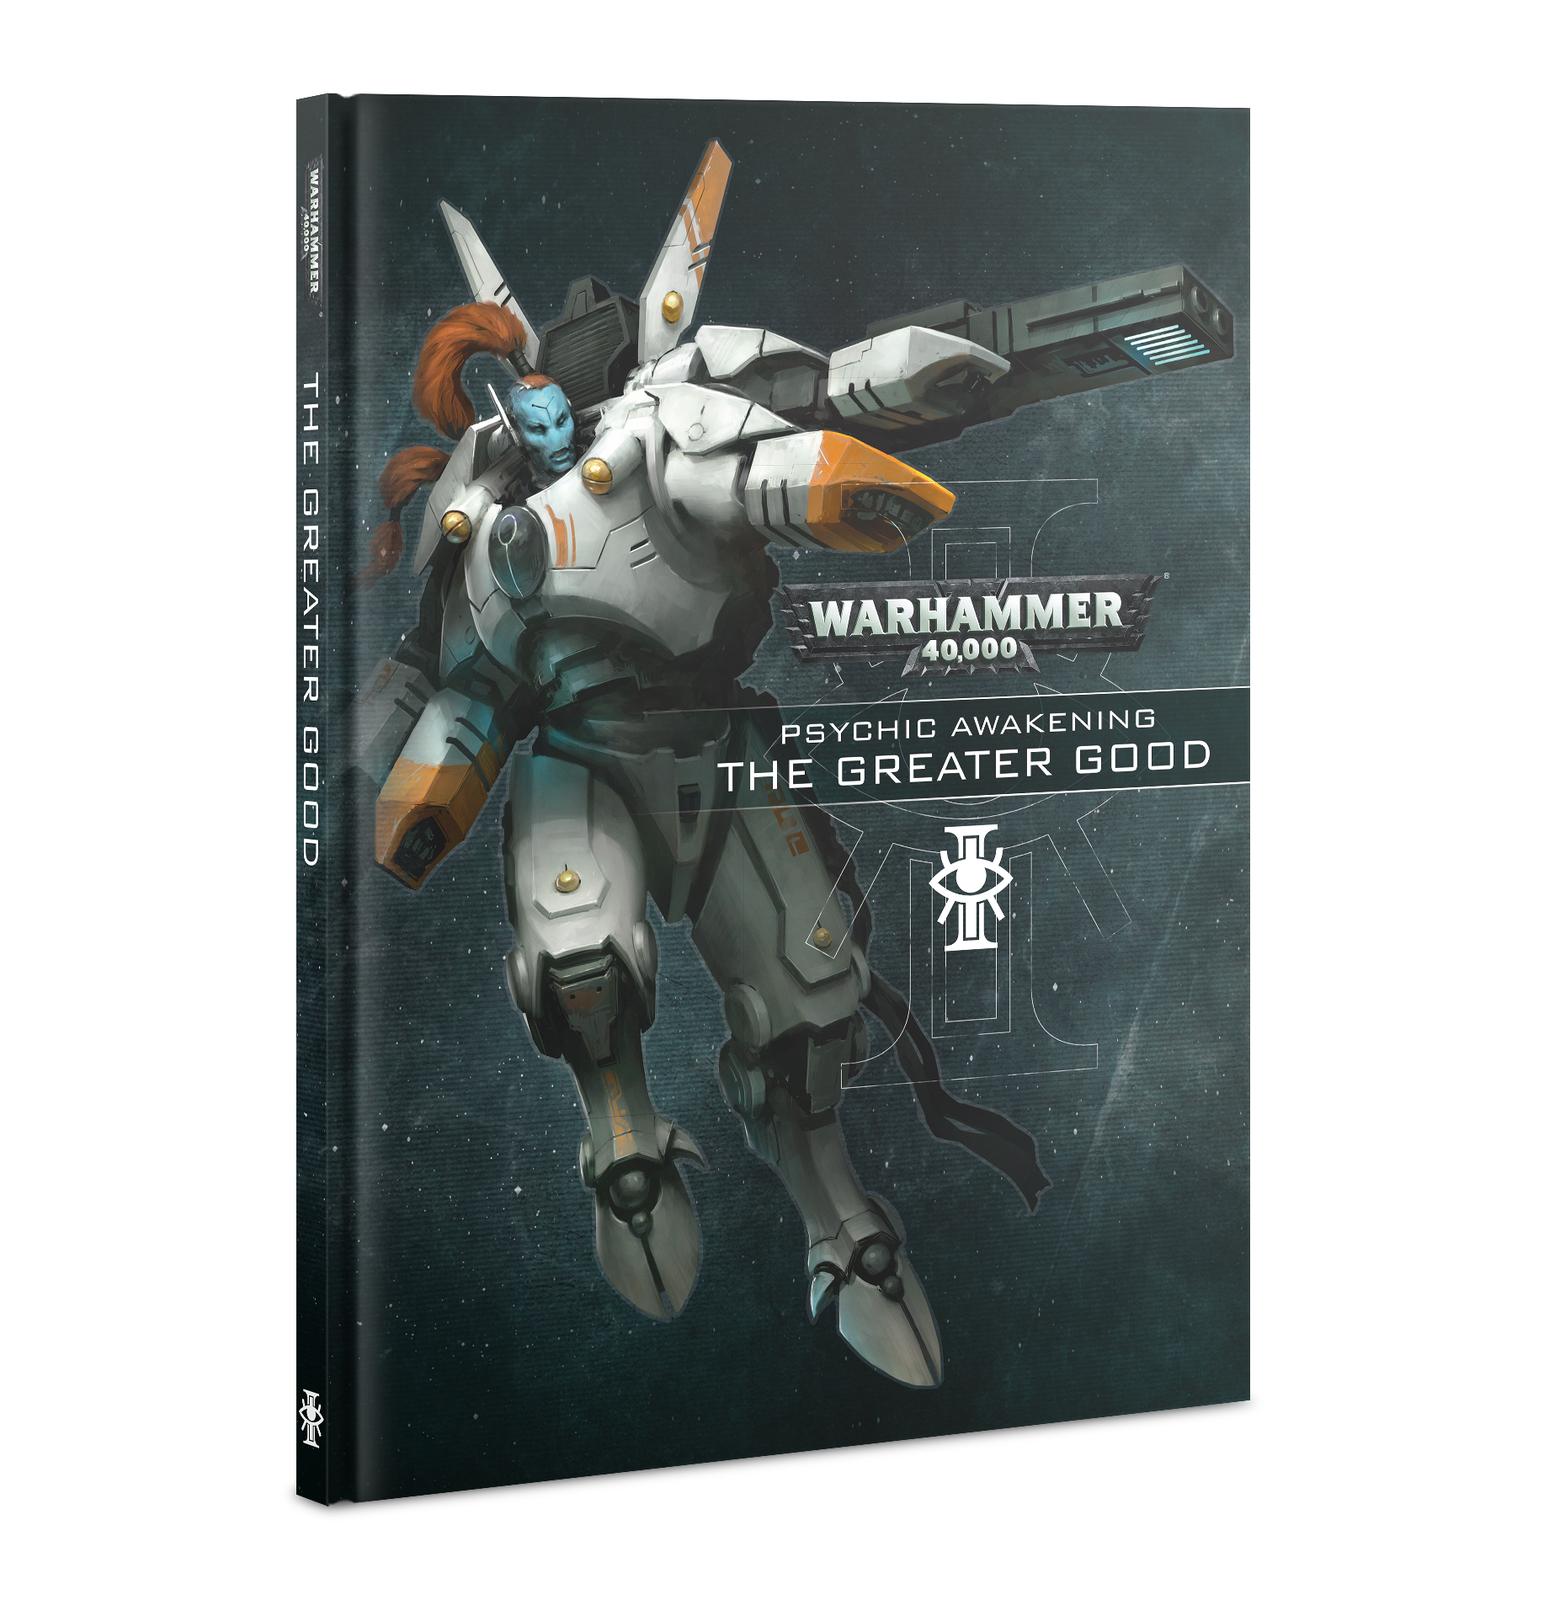 Warhammer 40,000 Psychic Awakening: The Greater Good image